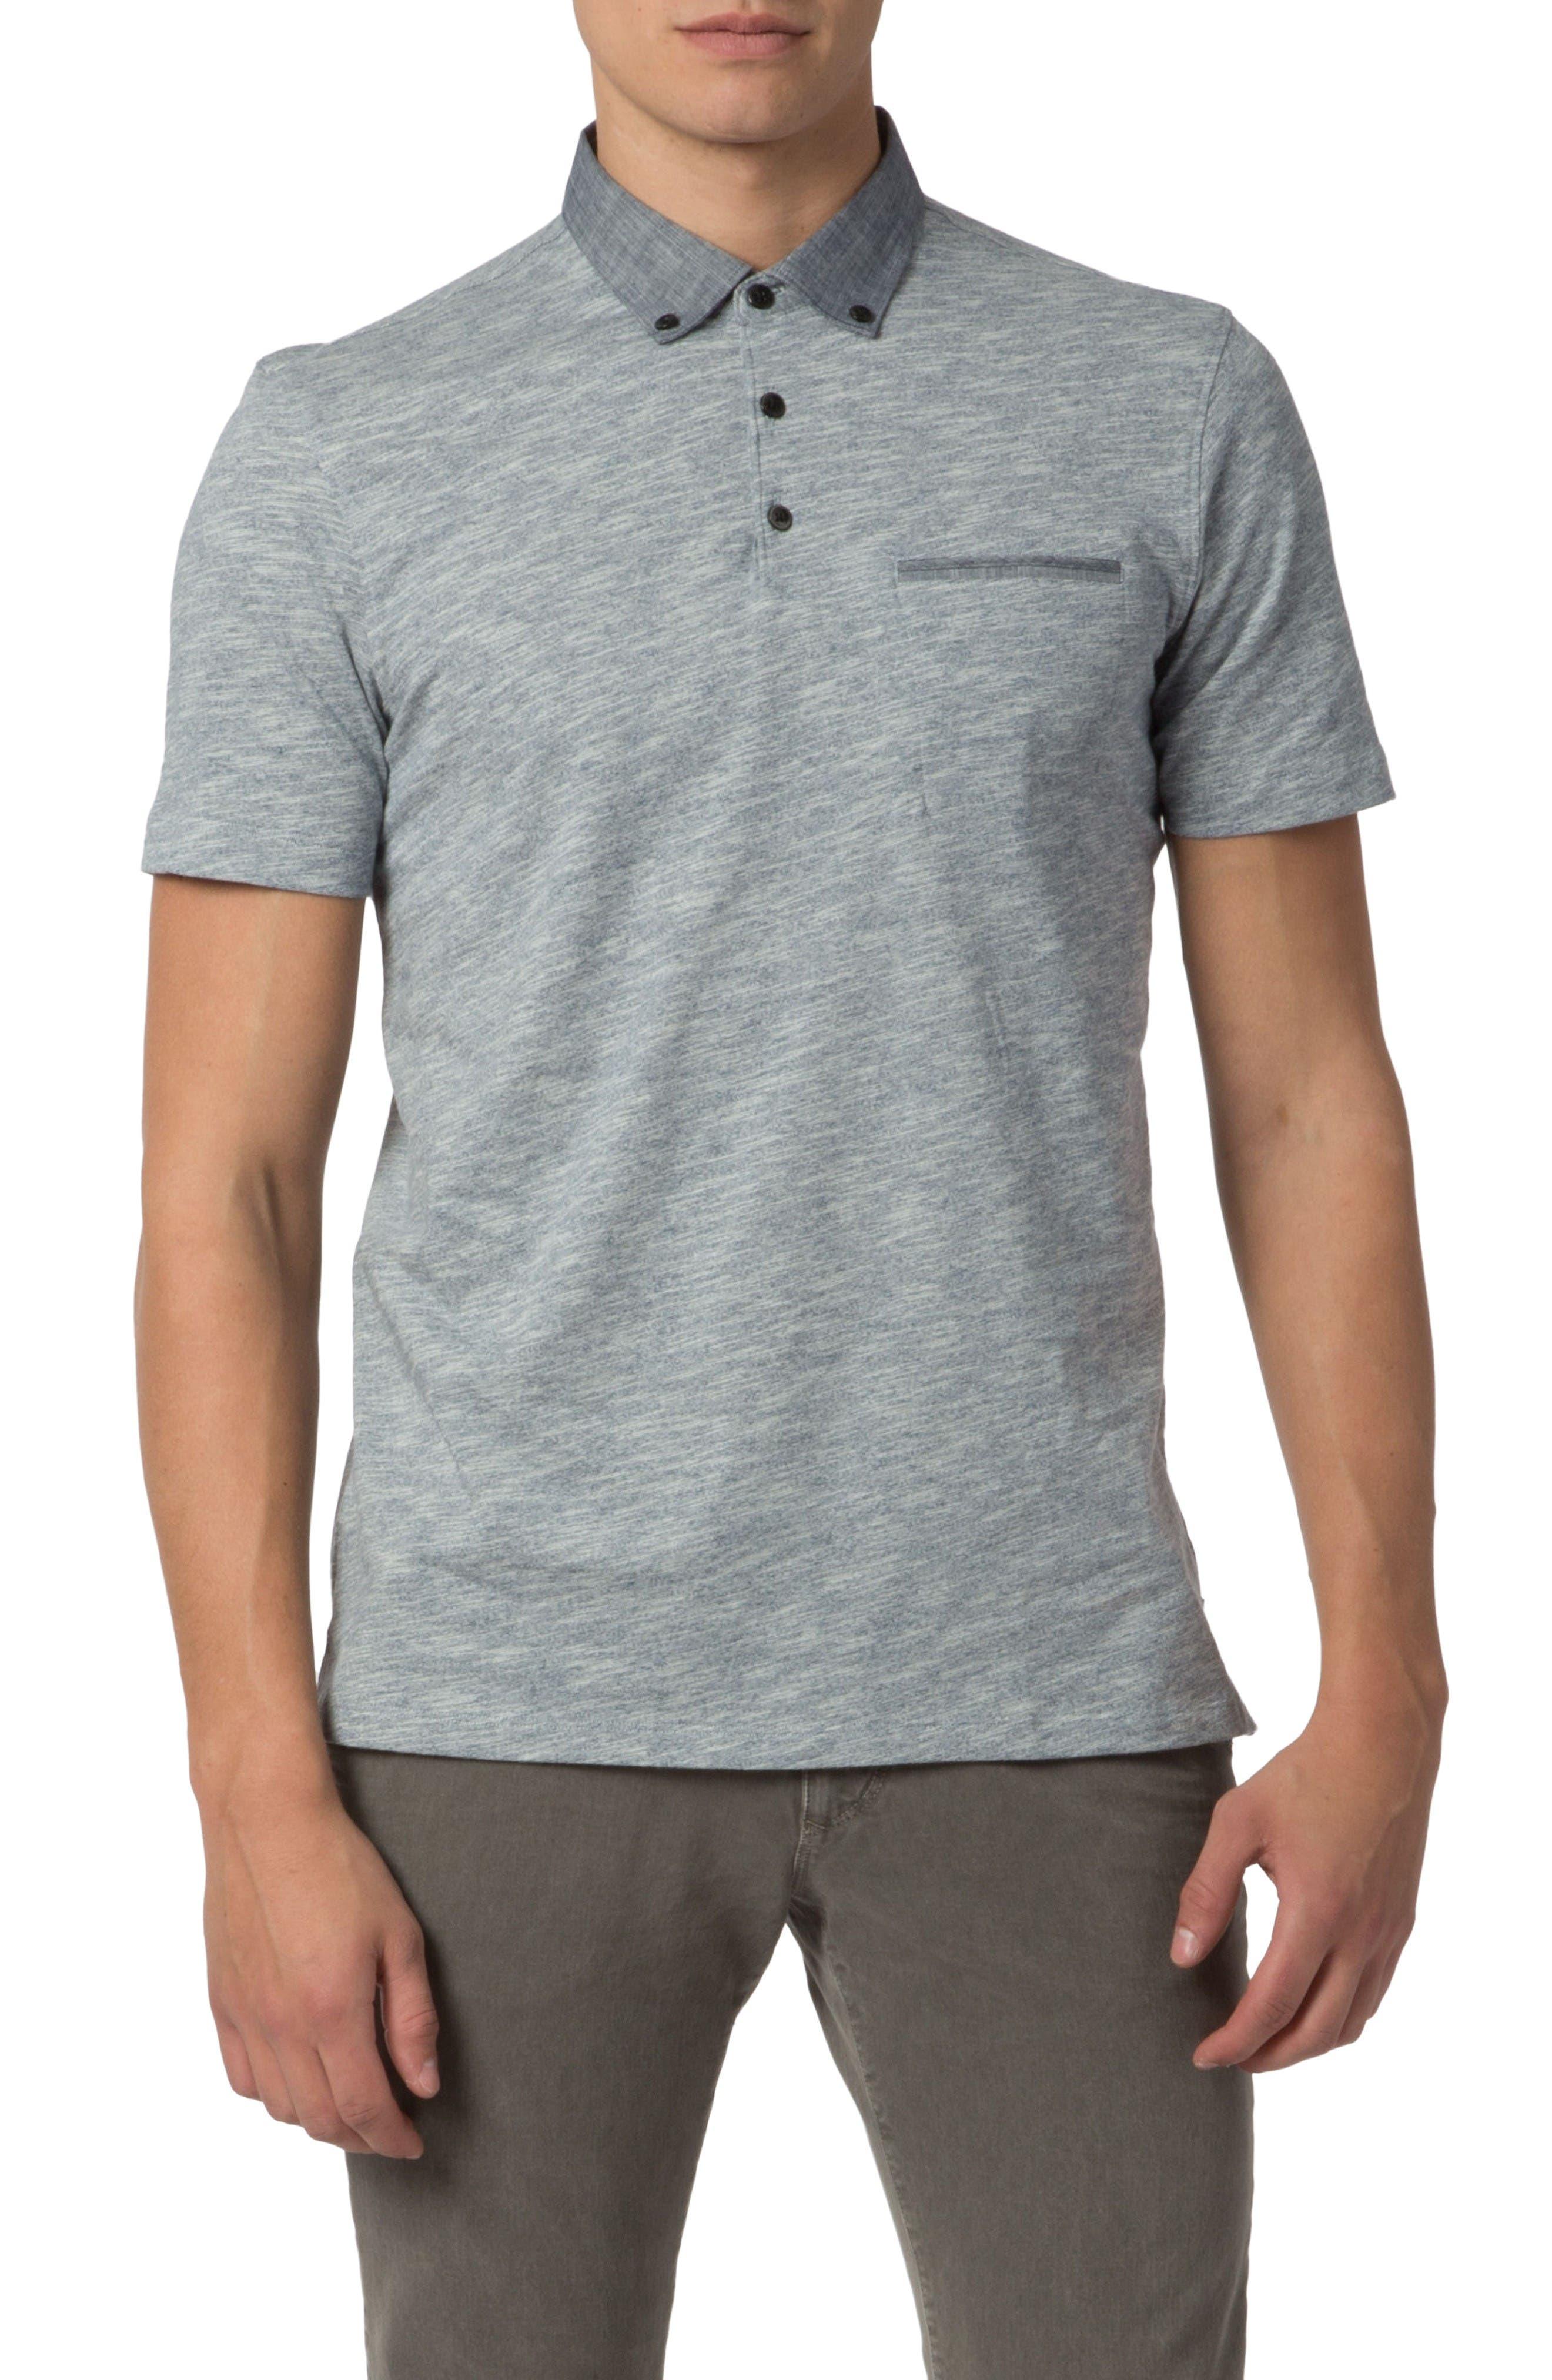 Alternate Image 1 Selected - Good Man Brand Heathered Stripe Polo